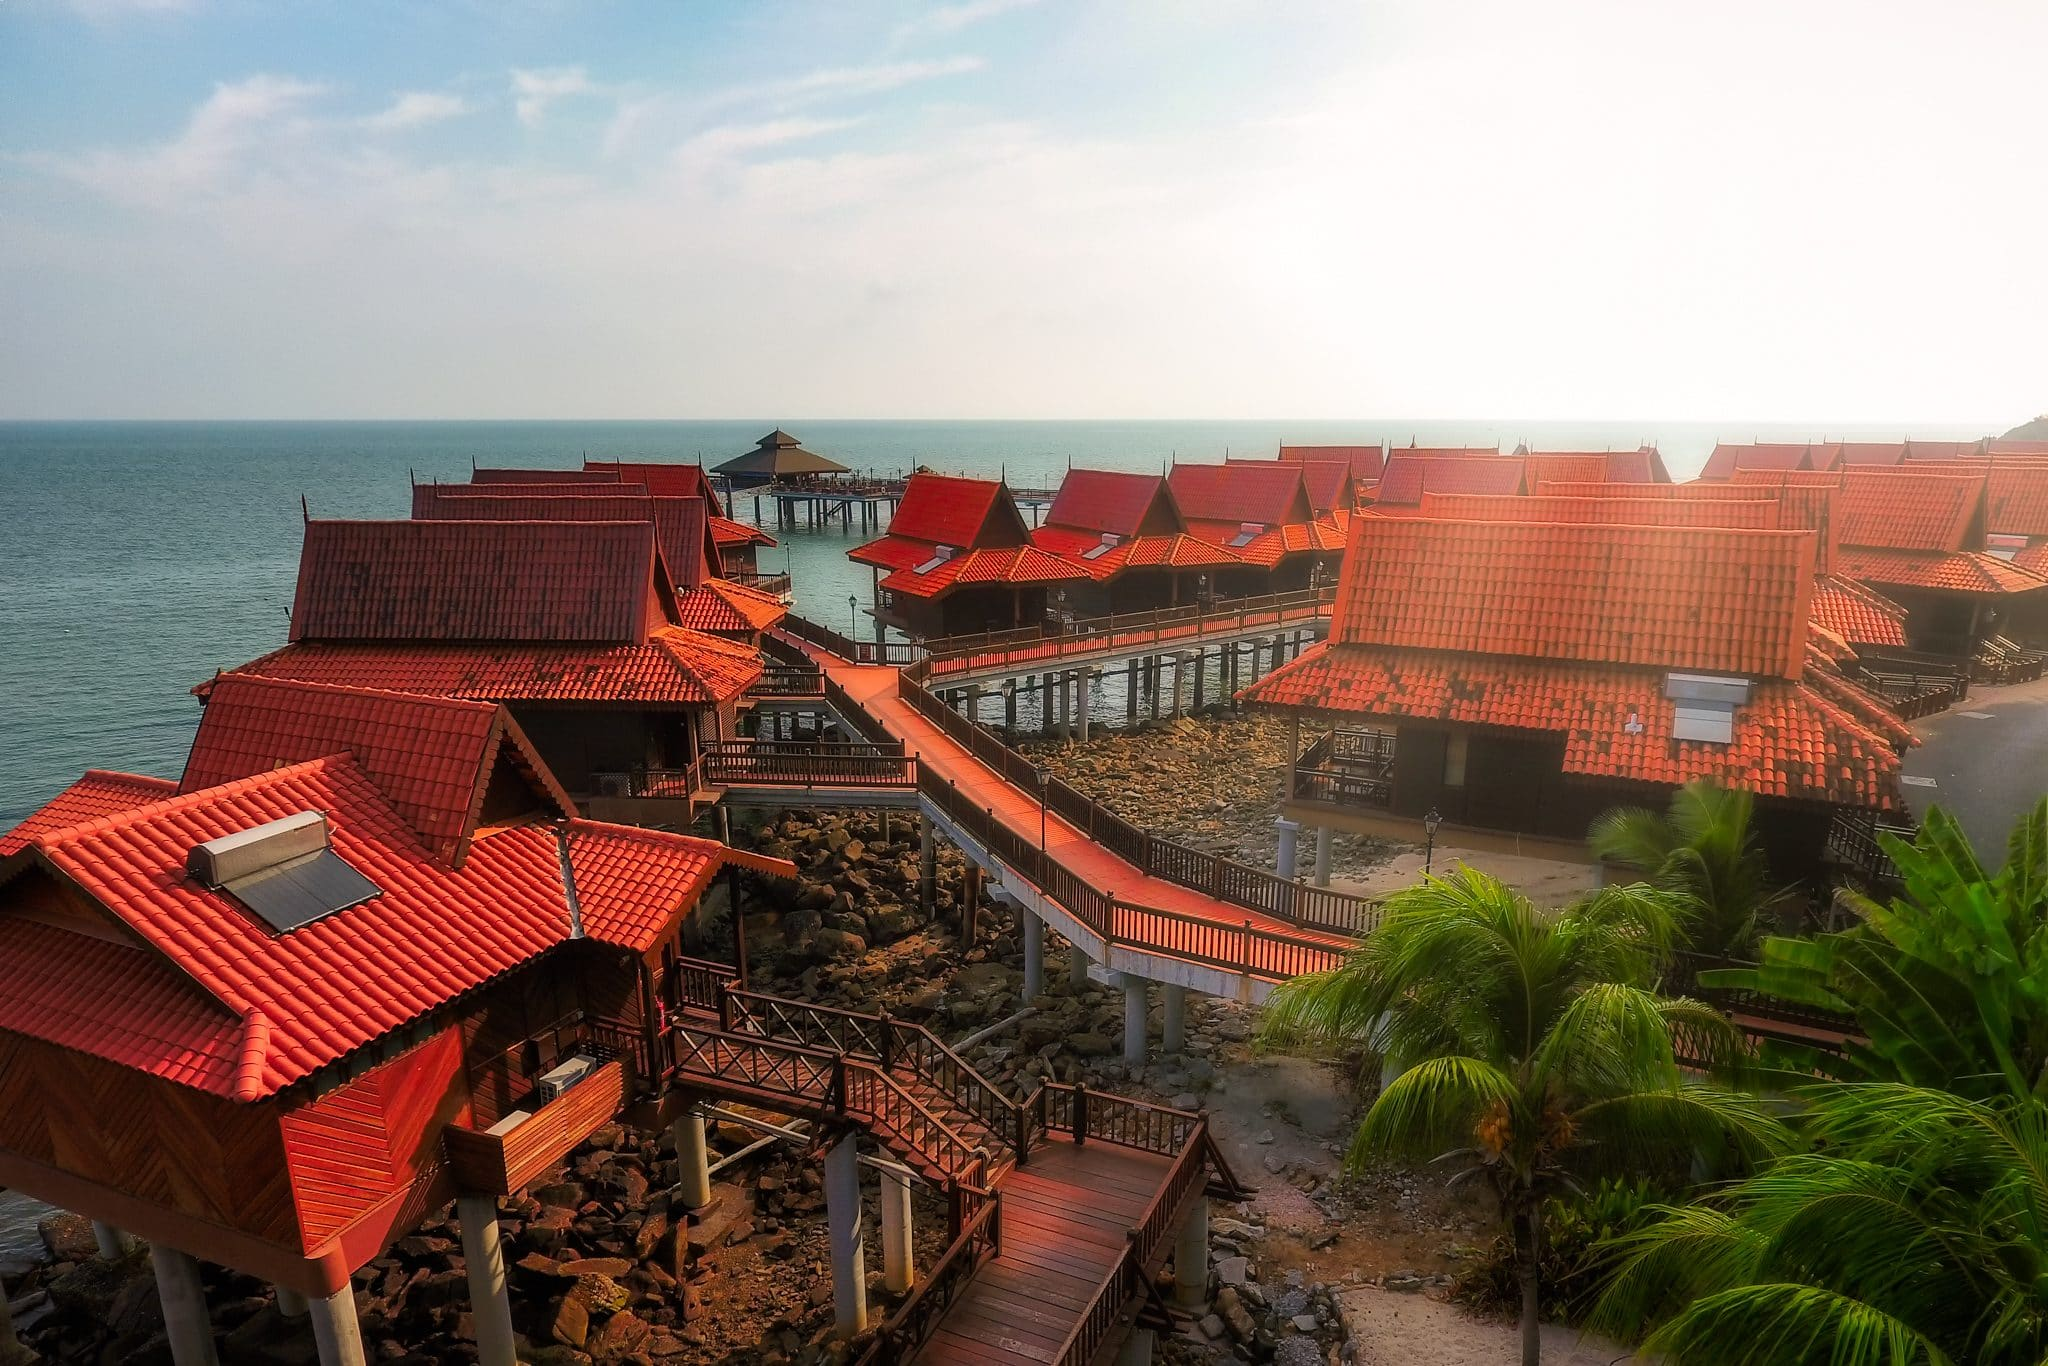 Langkawi Berjaya-Chalet, Blick von oben aus dem Himmel herab, Malaysia.